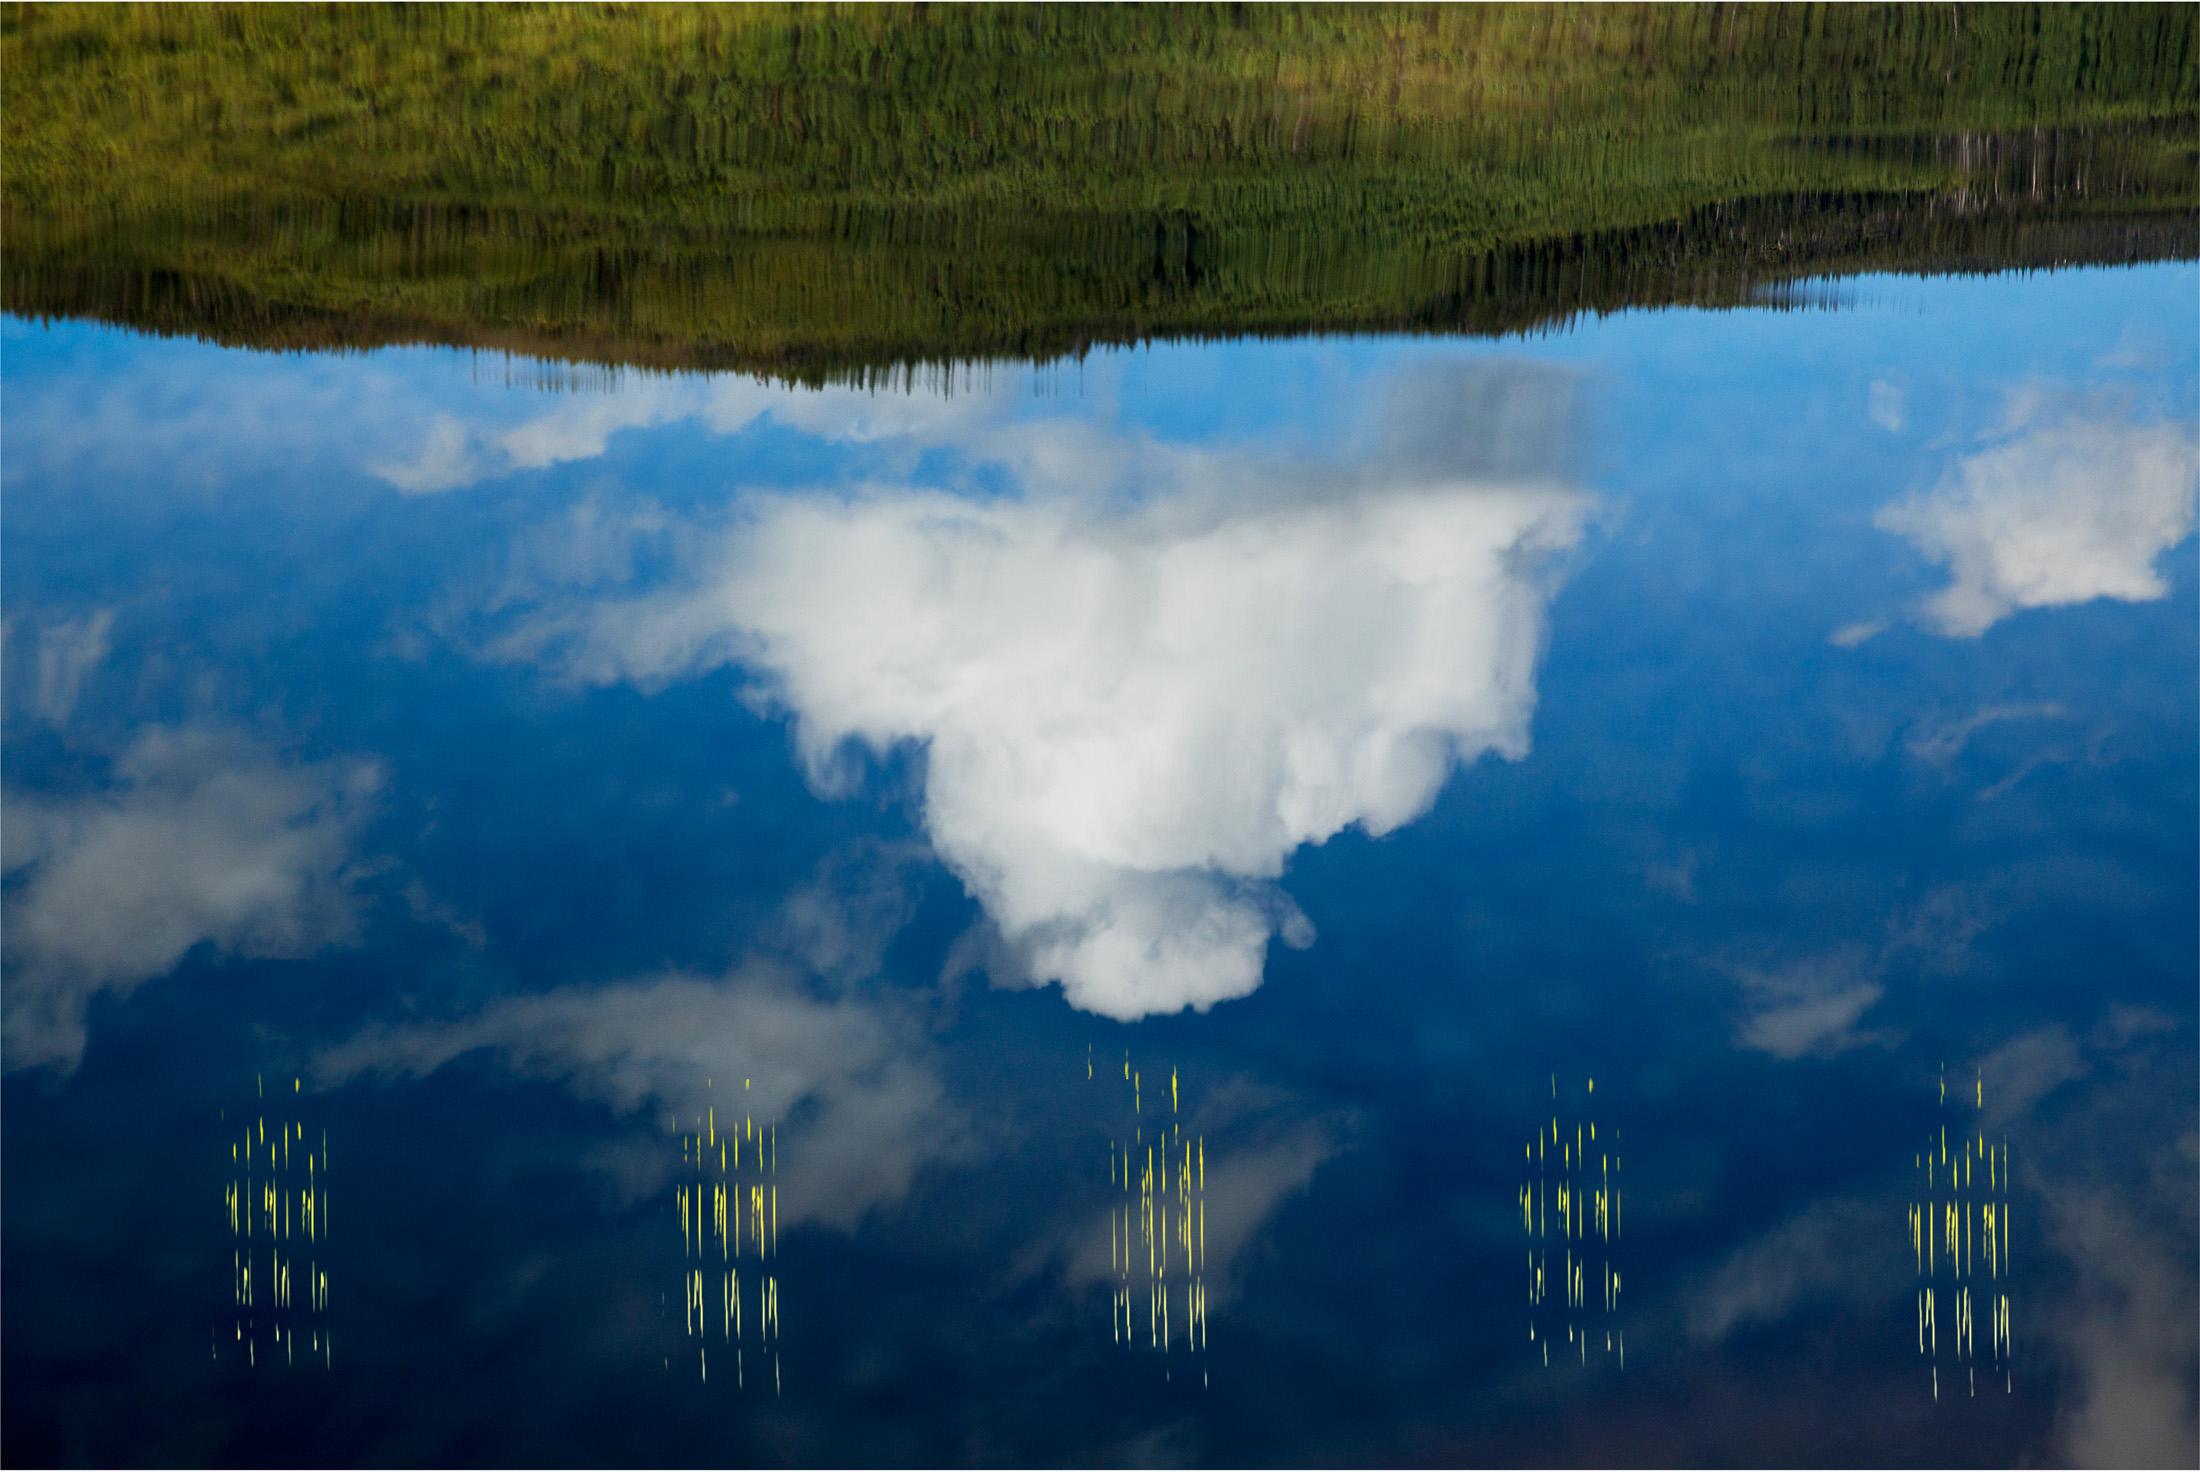 lake reflection, birdsong